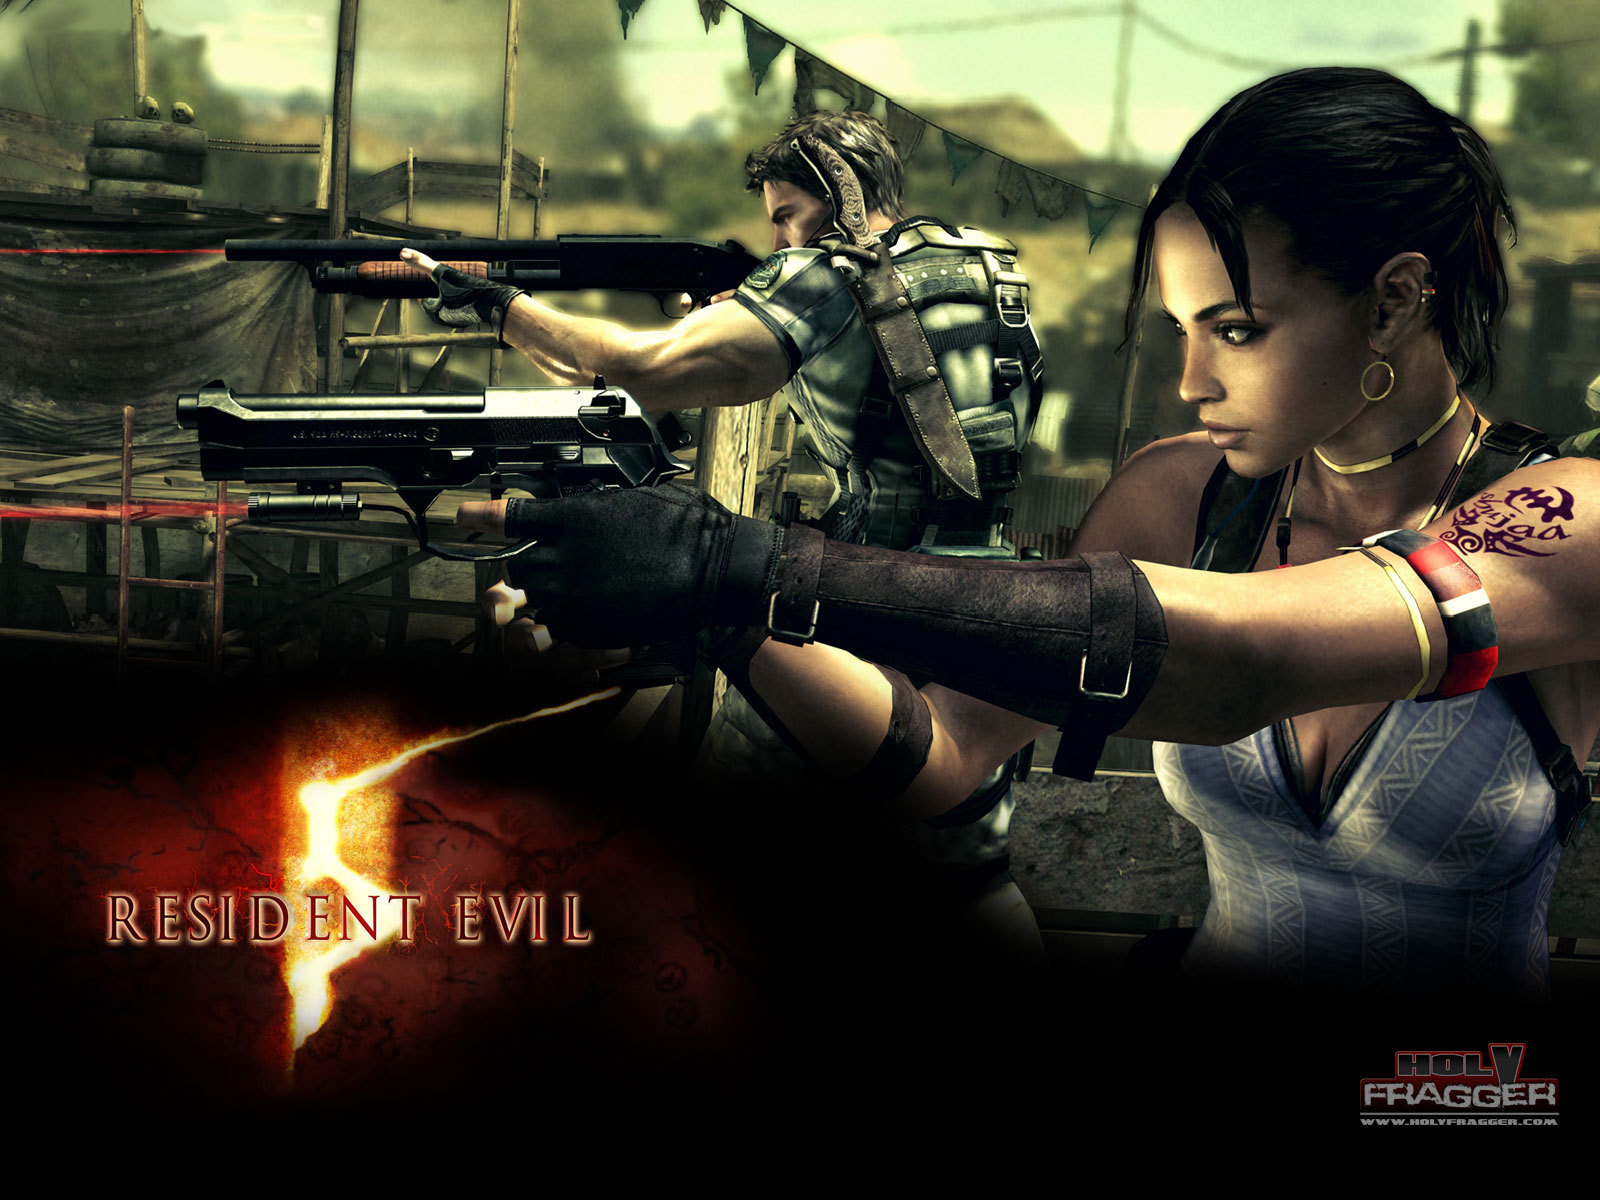 Resident Evil Wallpaper Resident Evil 5 Wallpaper 4931735